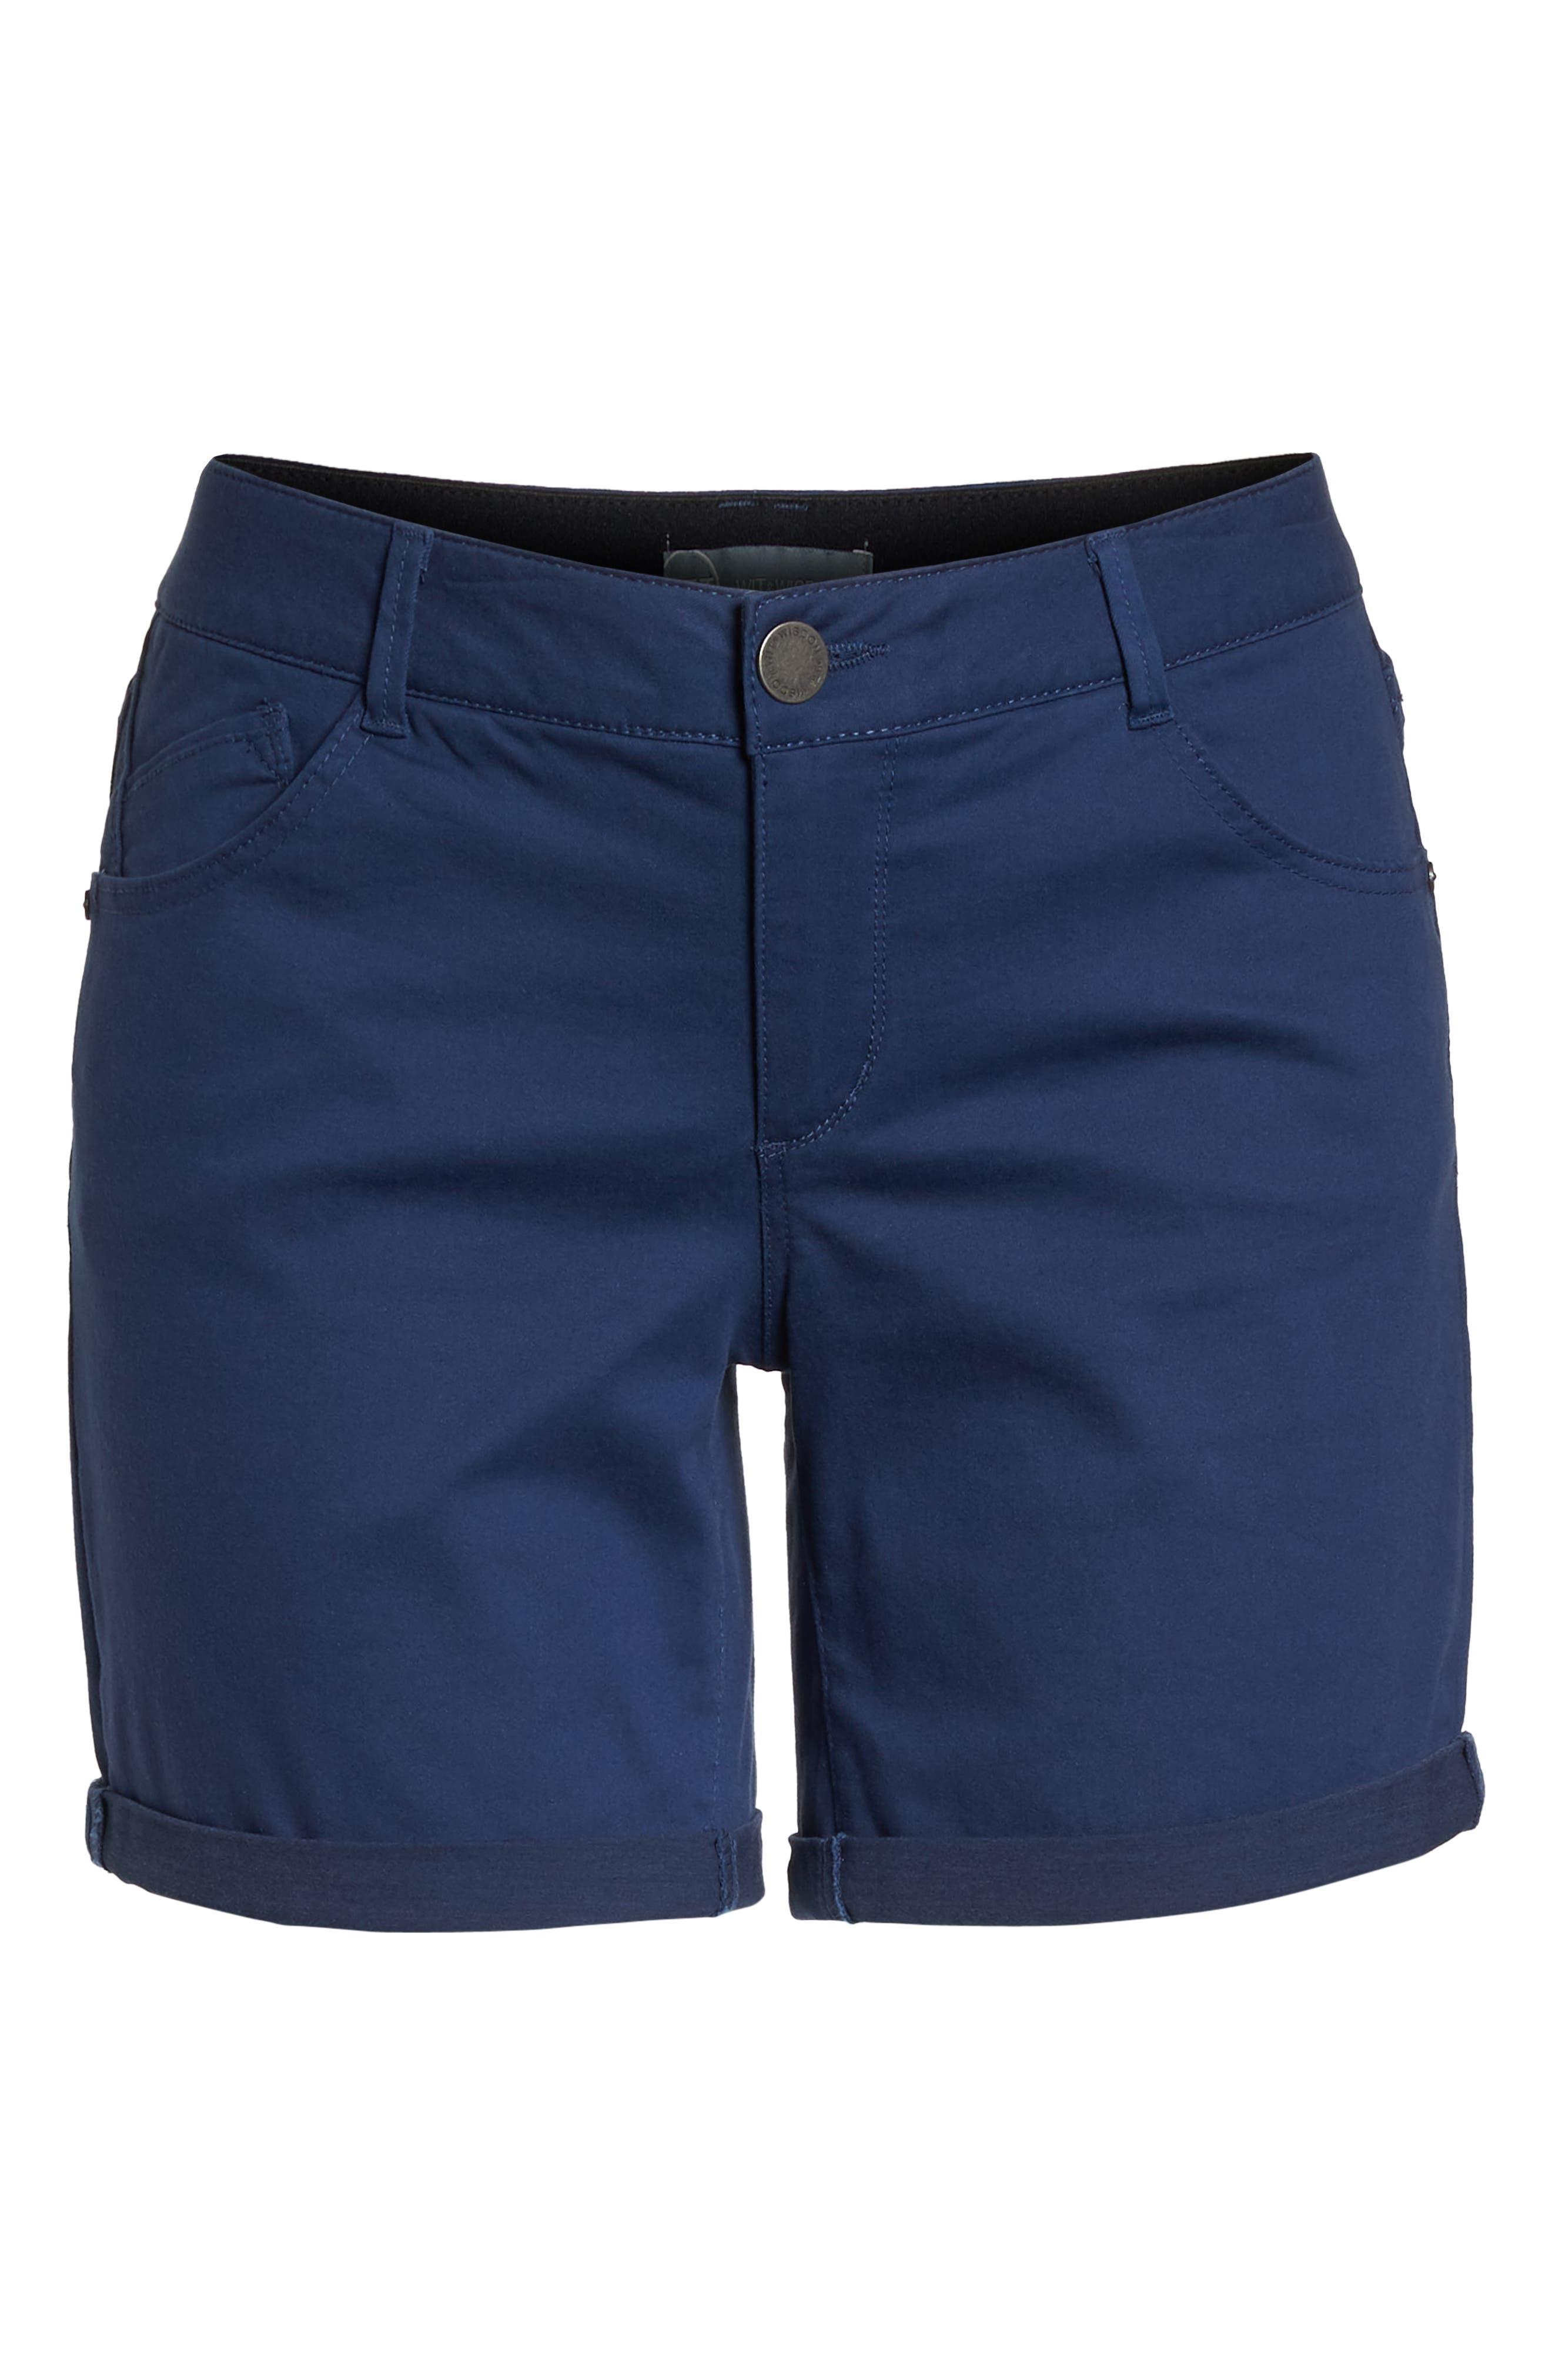 Ab-Solution Stretch Cotton Shorts,                             Alternate thumbnail 7, color,                             COASTAL BLUE